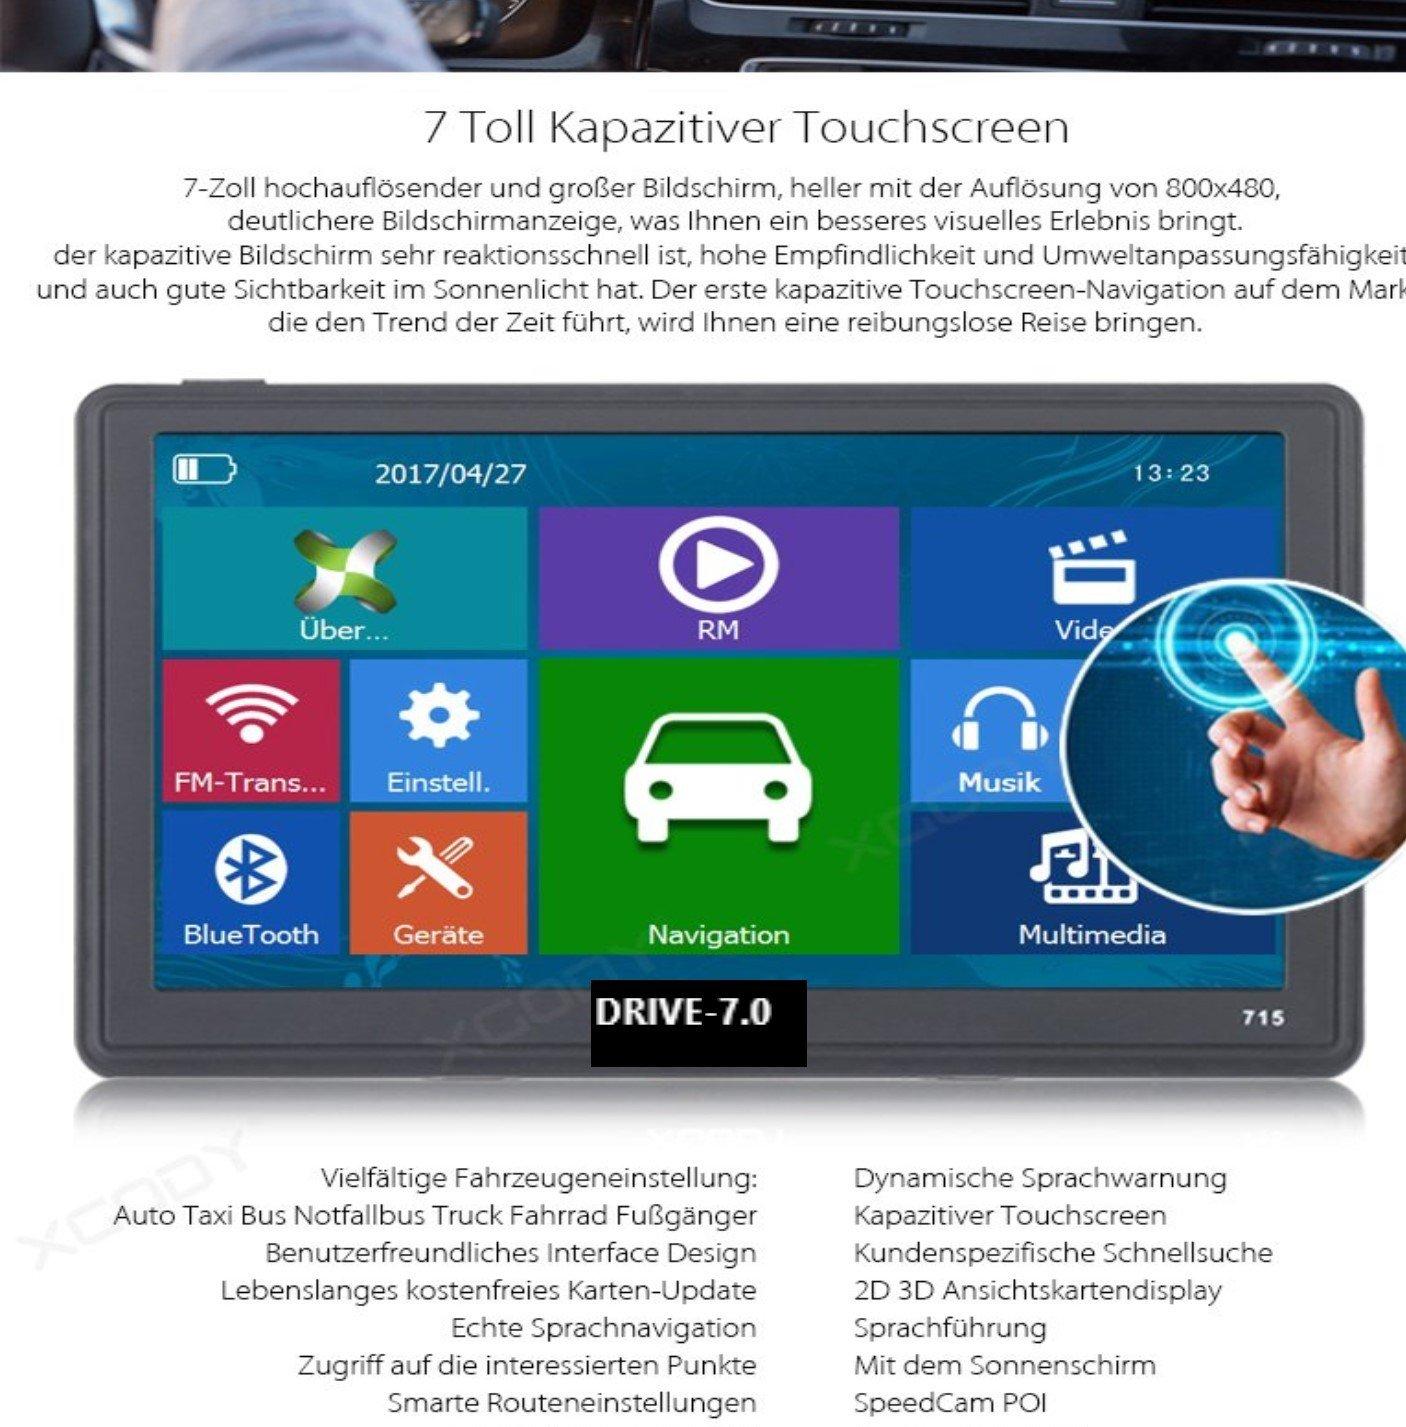 7 Zoll GPS Navigationssysteme Navi Drive-7.0 fü r LKW,PKW,Wohnmobil, Bus. 256MB. Kapazitiver Touchscreen. DEUTSCHE HÄ NDLER. Radarwarner, Kostenlos Update, 8GB. Gratis Sonnenblende DRIVE-TECH